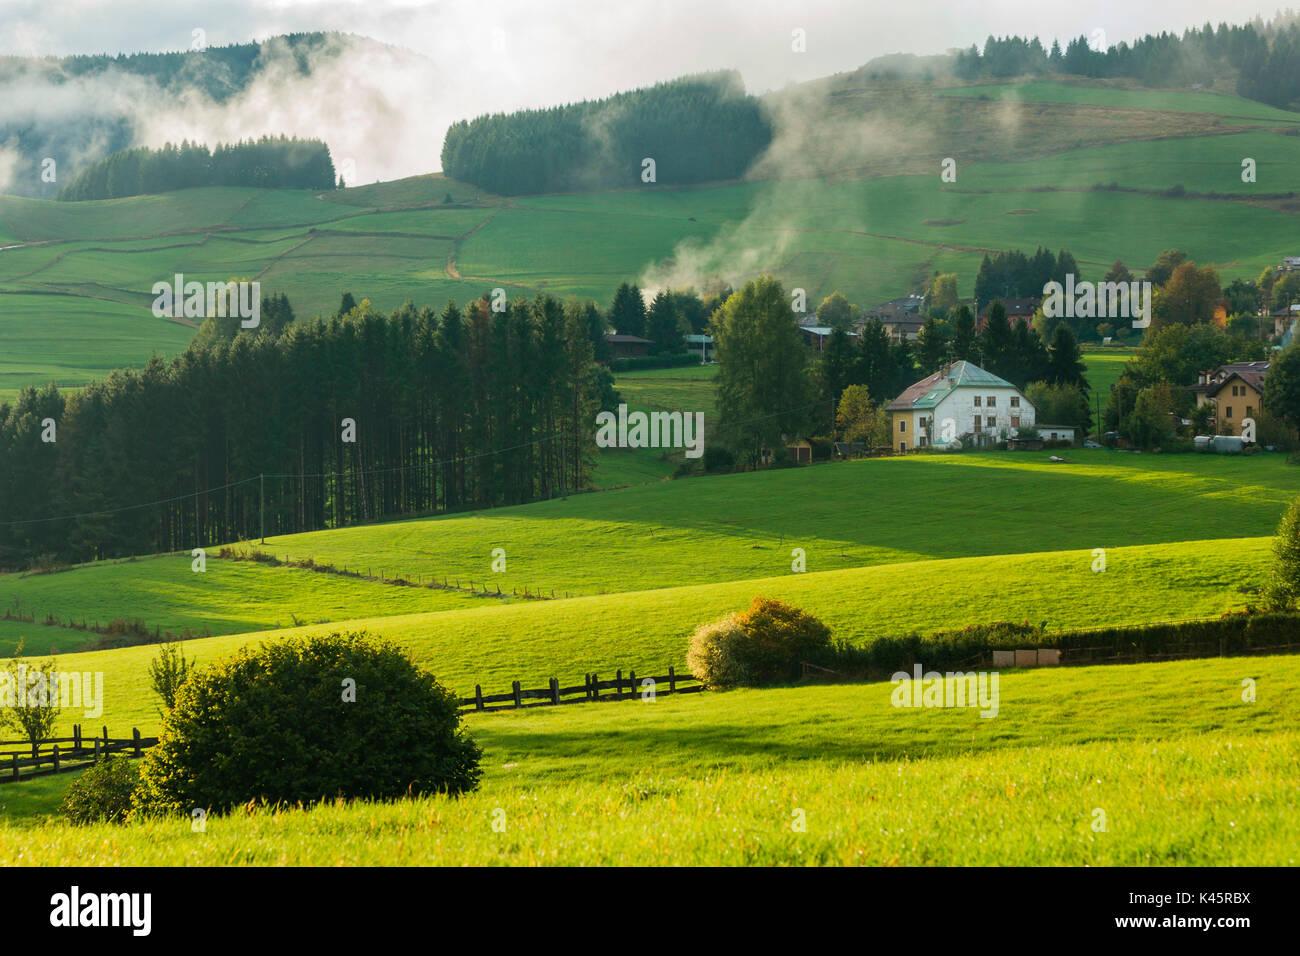 Altopiano of Asiago, Province of Vicenza, Veneto, Italy. - Stock Image